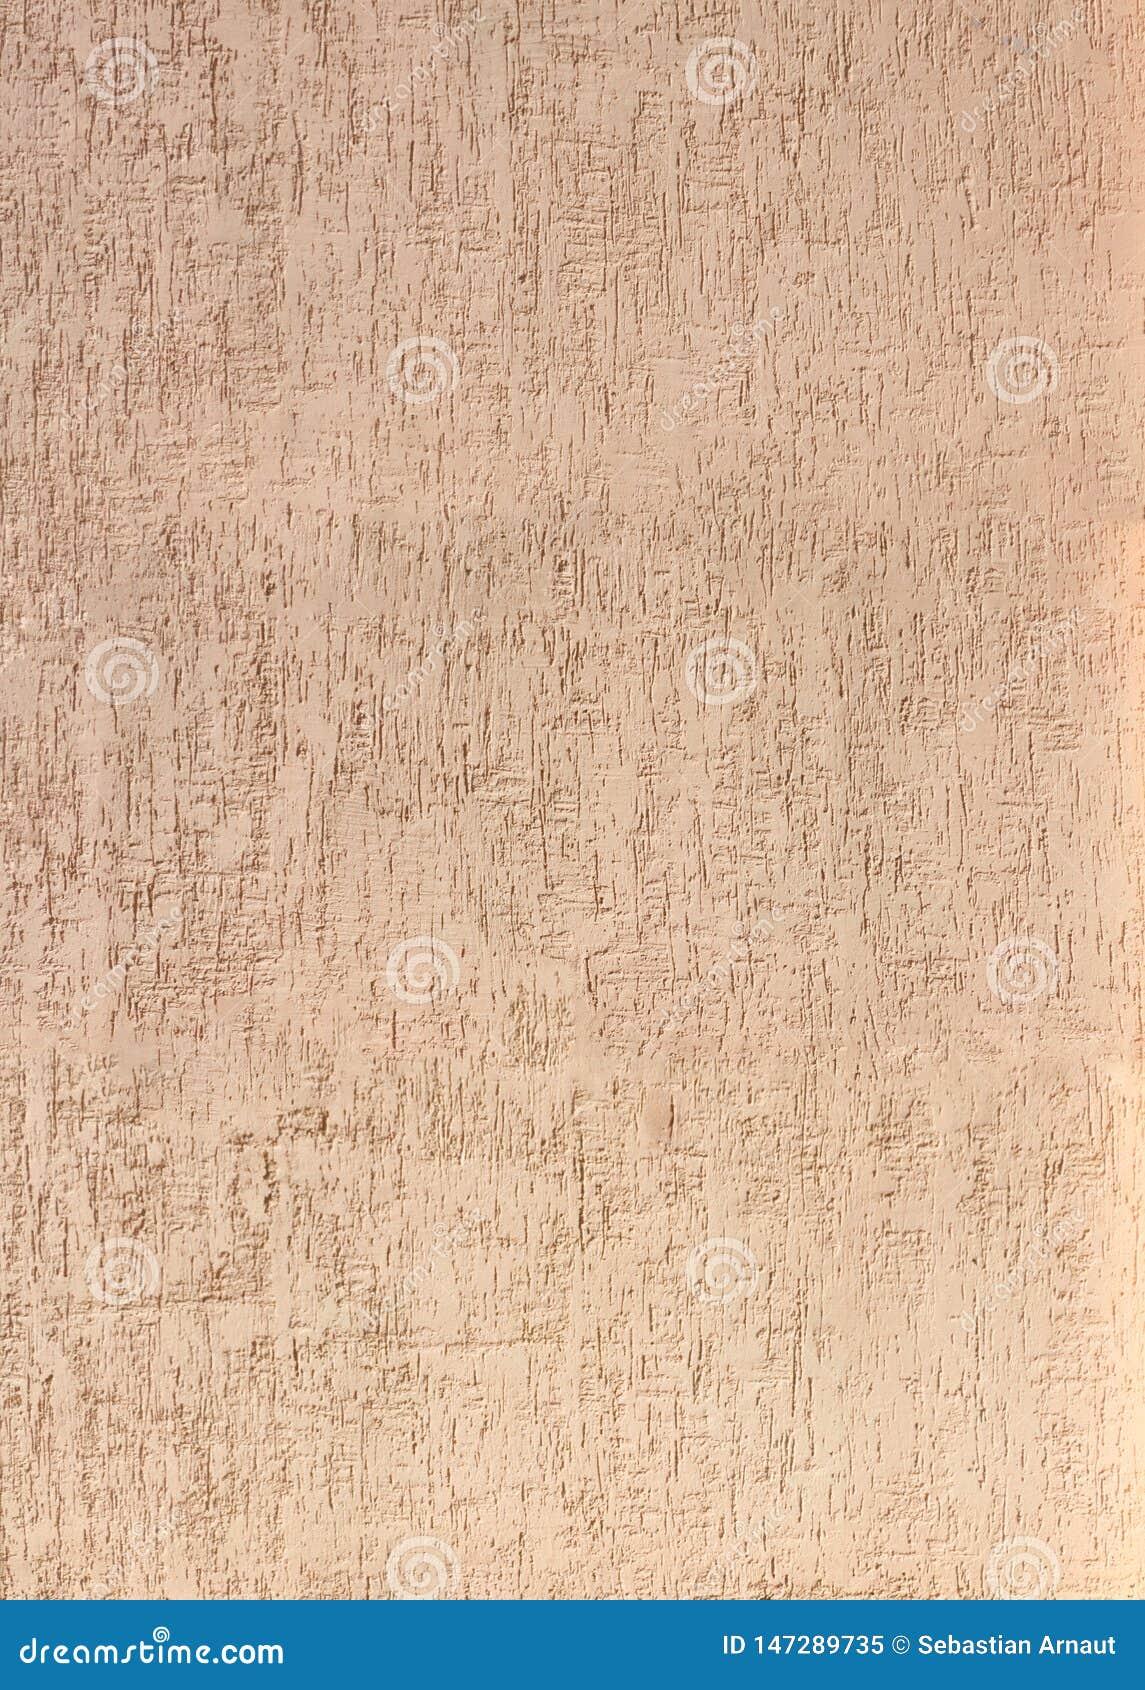 Tekstura dekoracyjna sztukateryjna korowata ściga jako tło